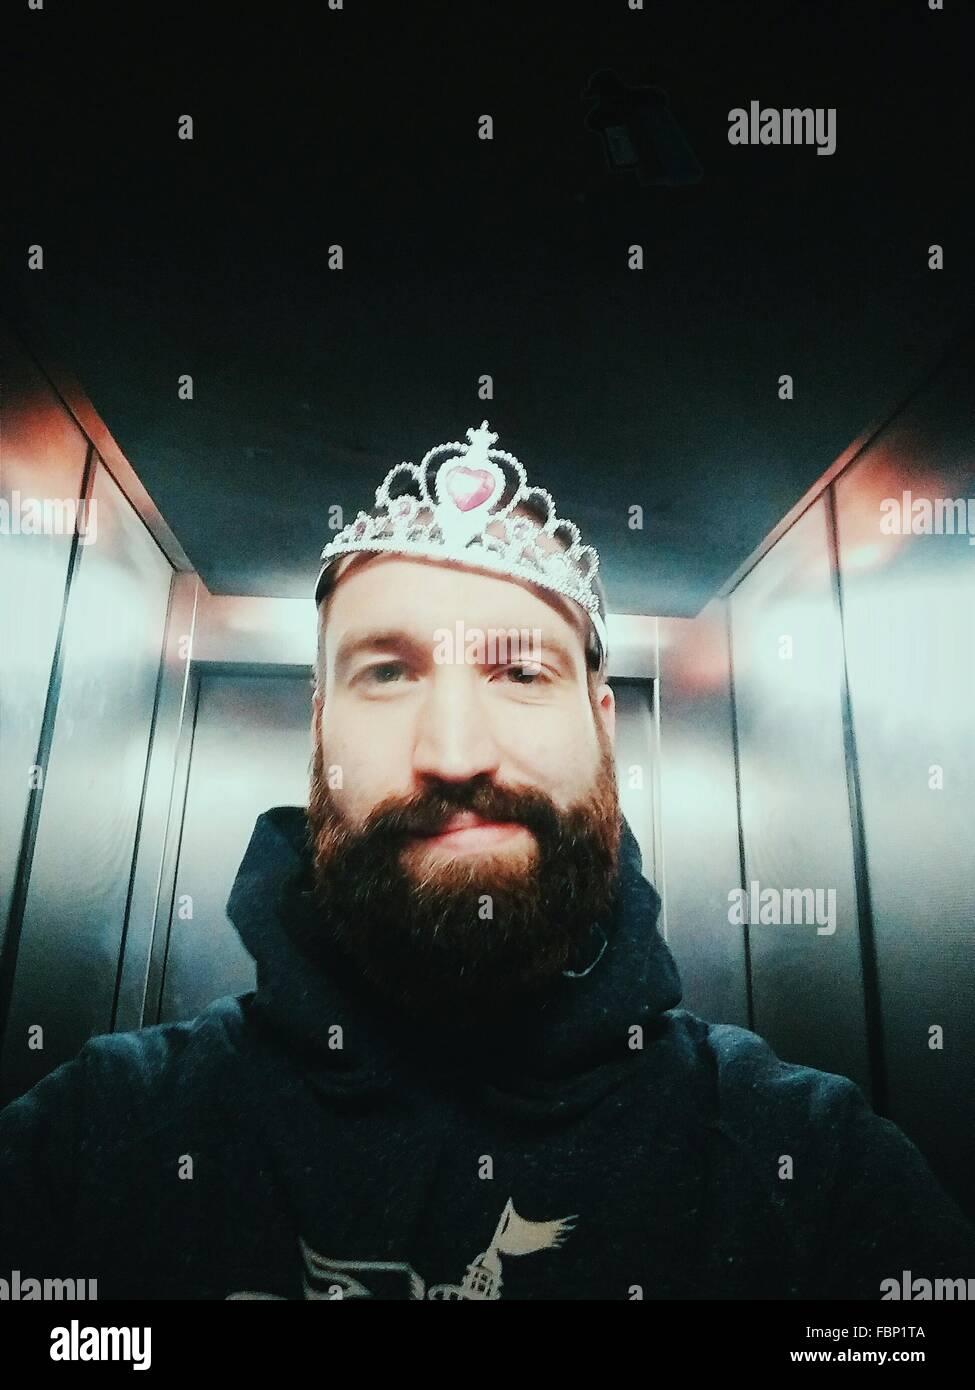 Portrait Of Man Wearing Crown In Elevator - Stock Image